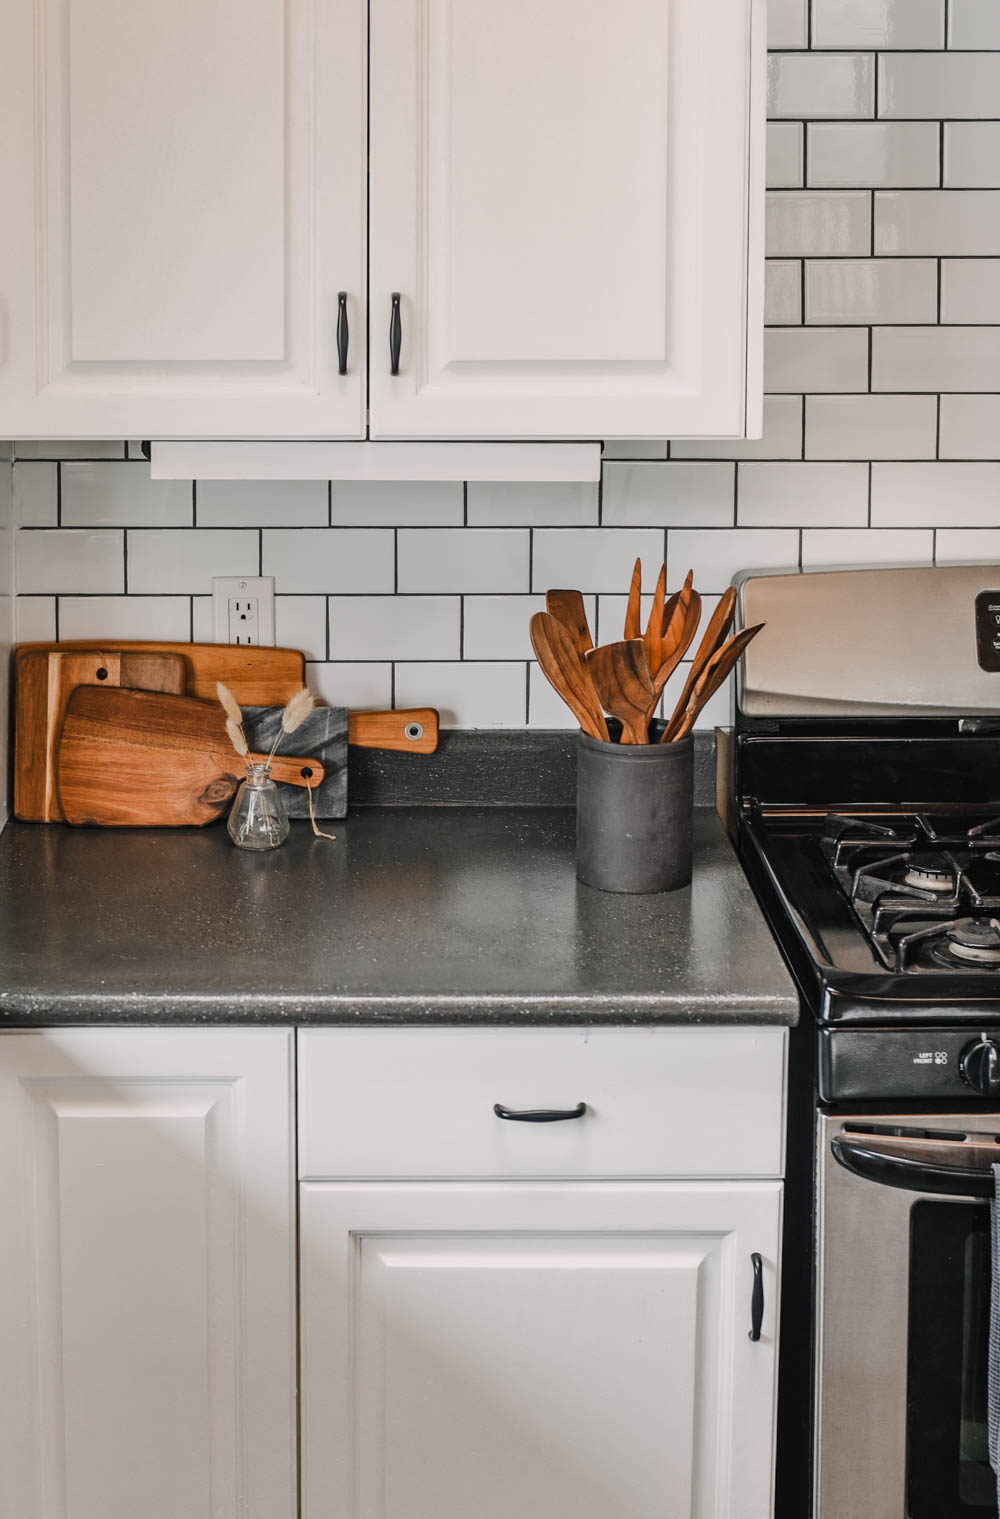 Modern Farmhouse kitchen with subway tile backsplash